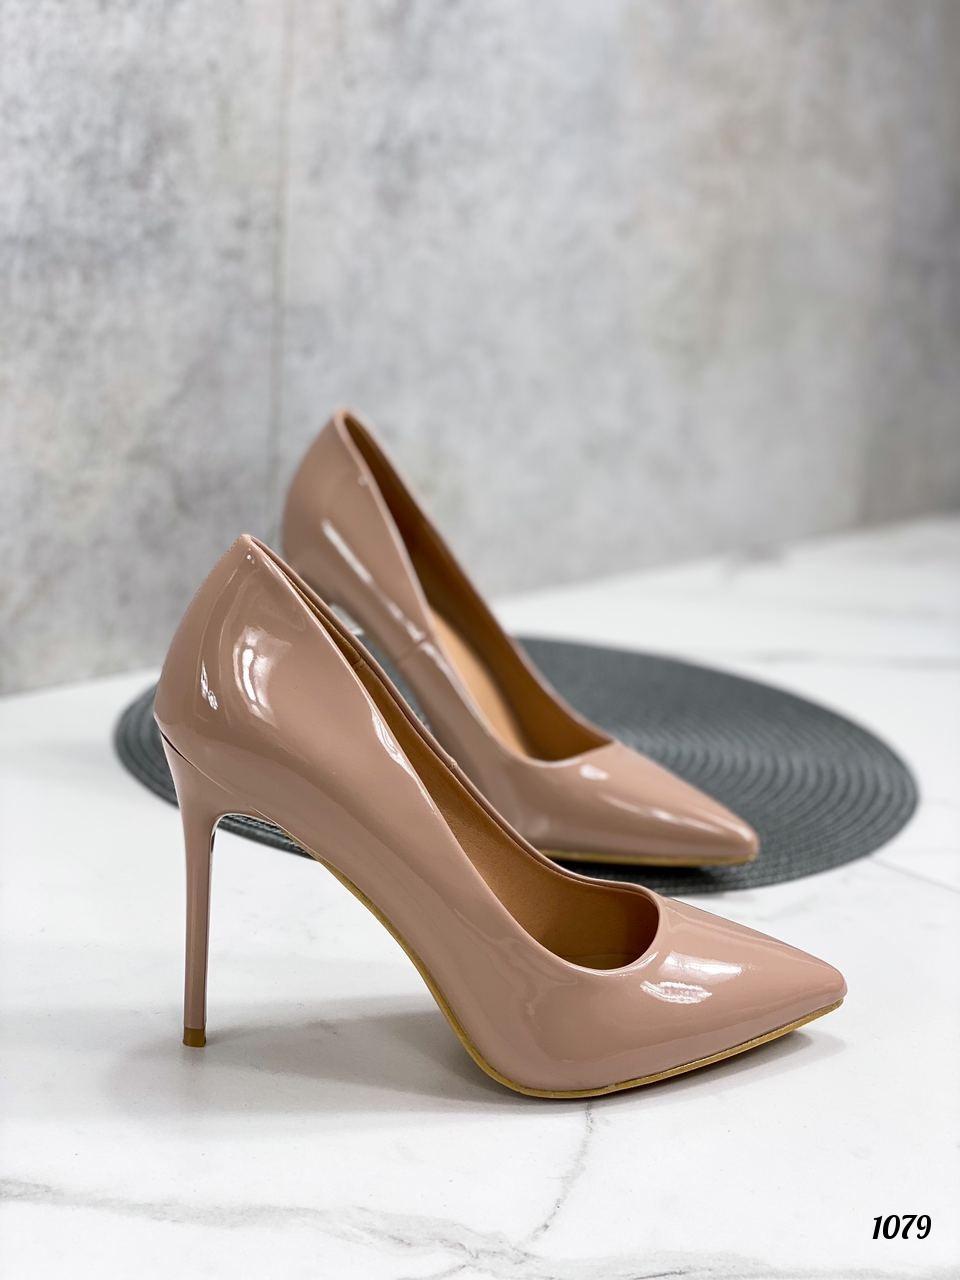 Туфли женские бежевые эко-лак на каблуке 10 см